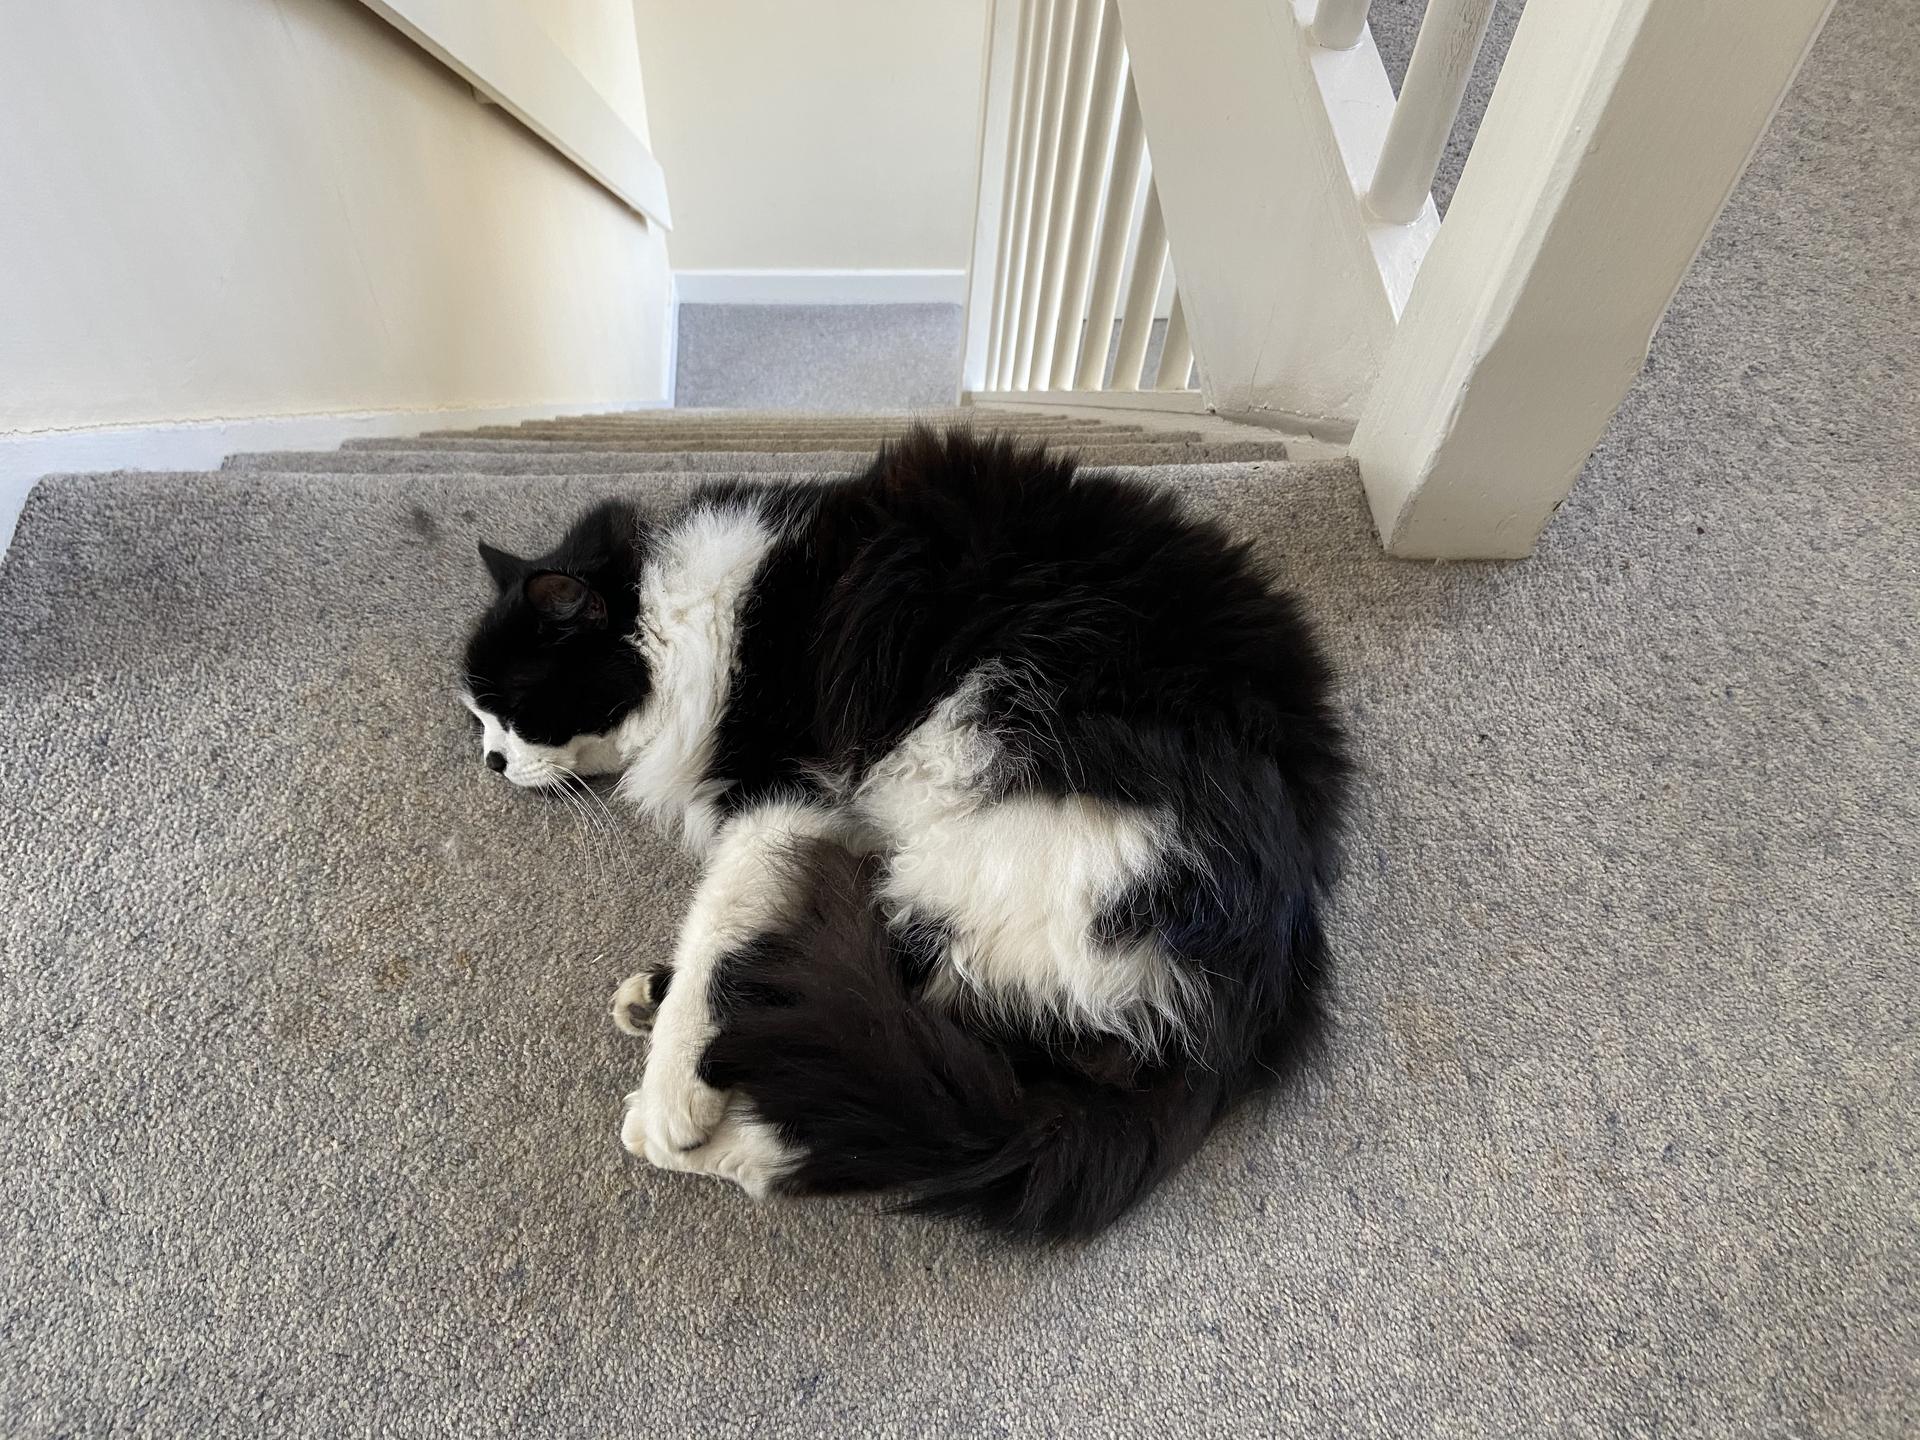 Felis silvestris (domestic cat) 'Mr Mittens' – guarding the stair – Mar 2020